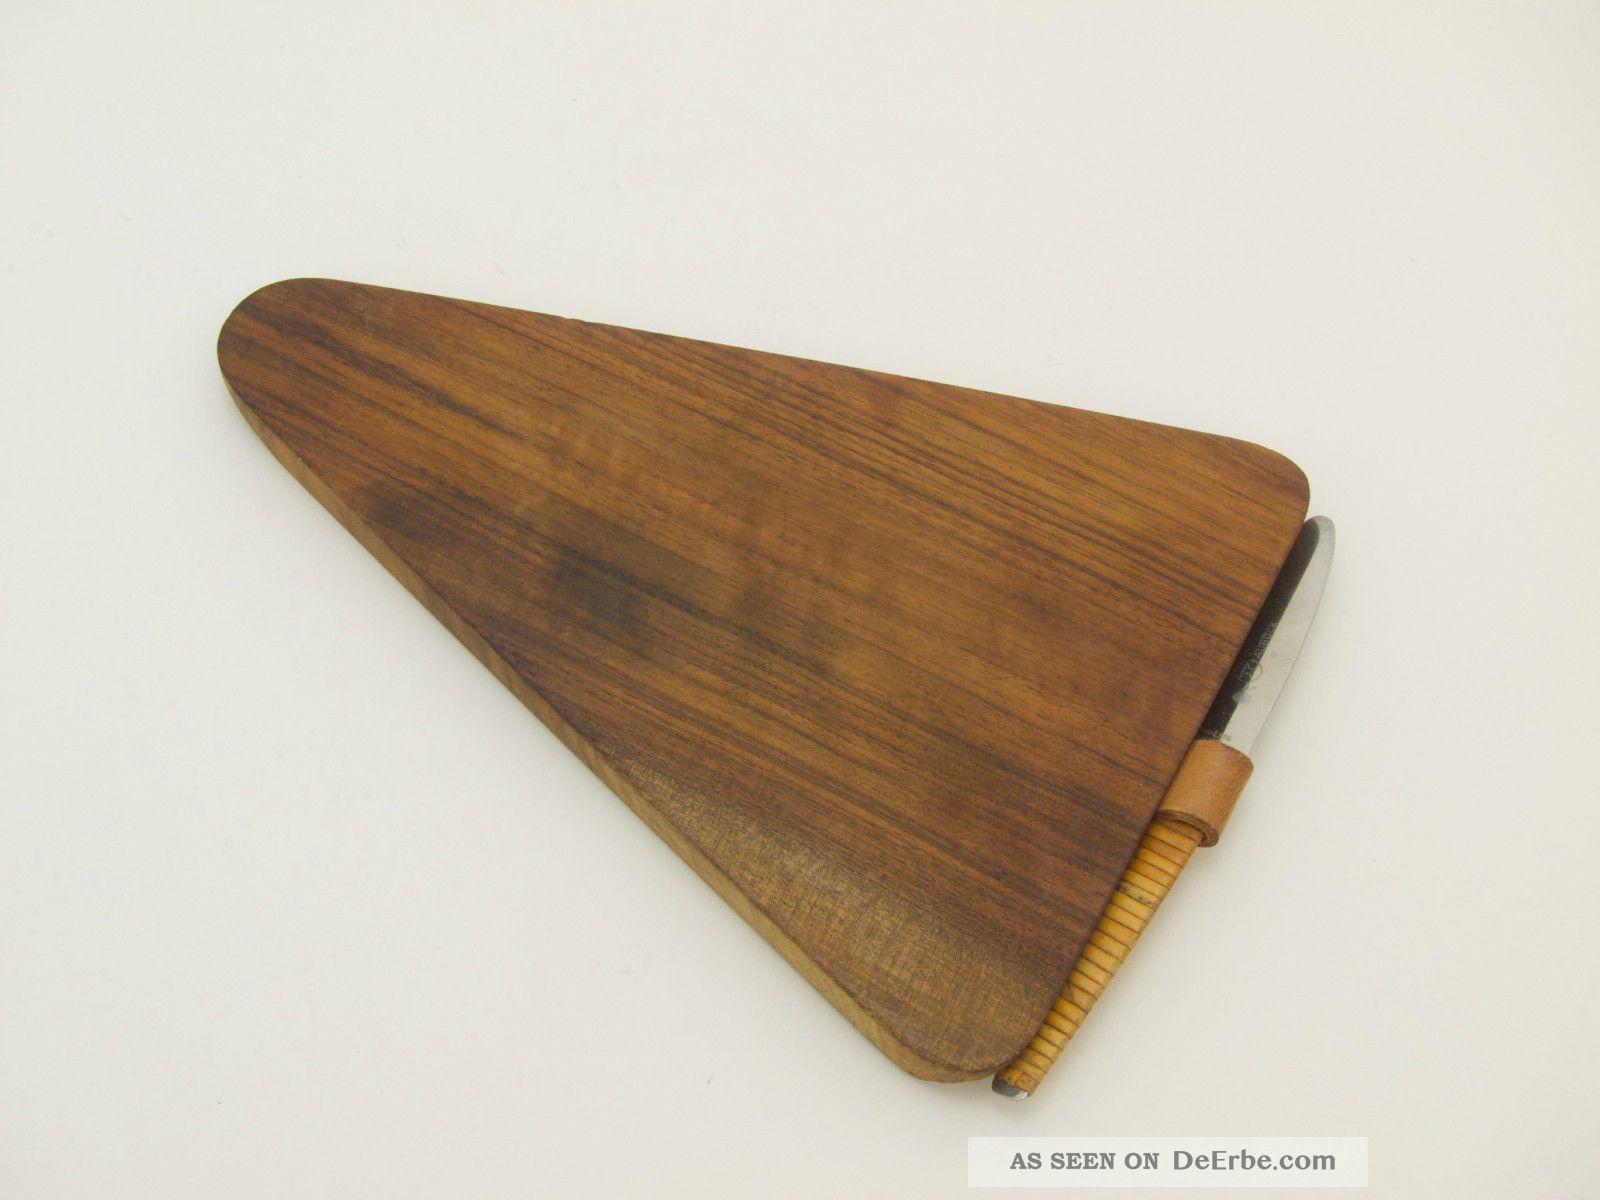 carl aub ck schneidebrett mit messer chopping board with knife. Black Bedroom Furniture Sets. Home Design Ideas